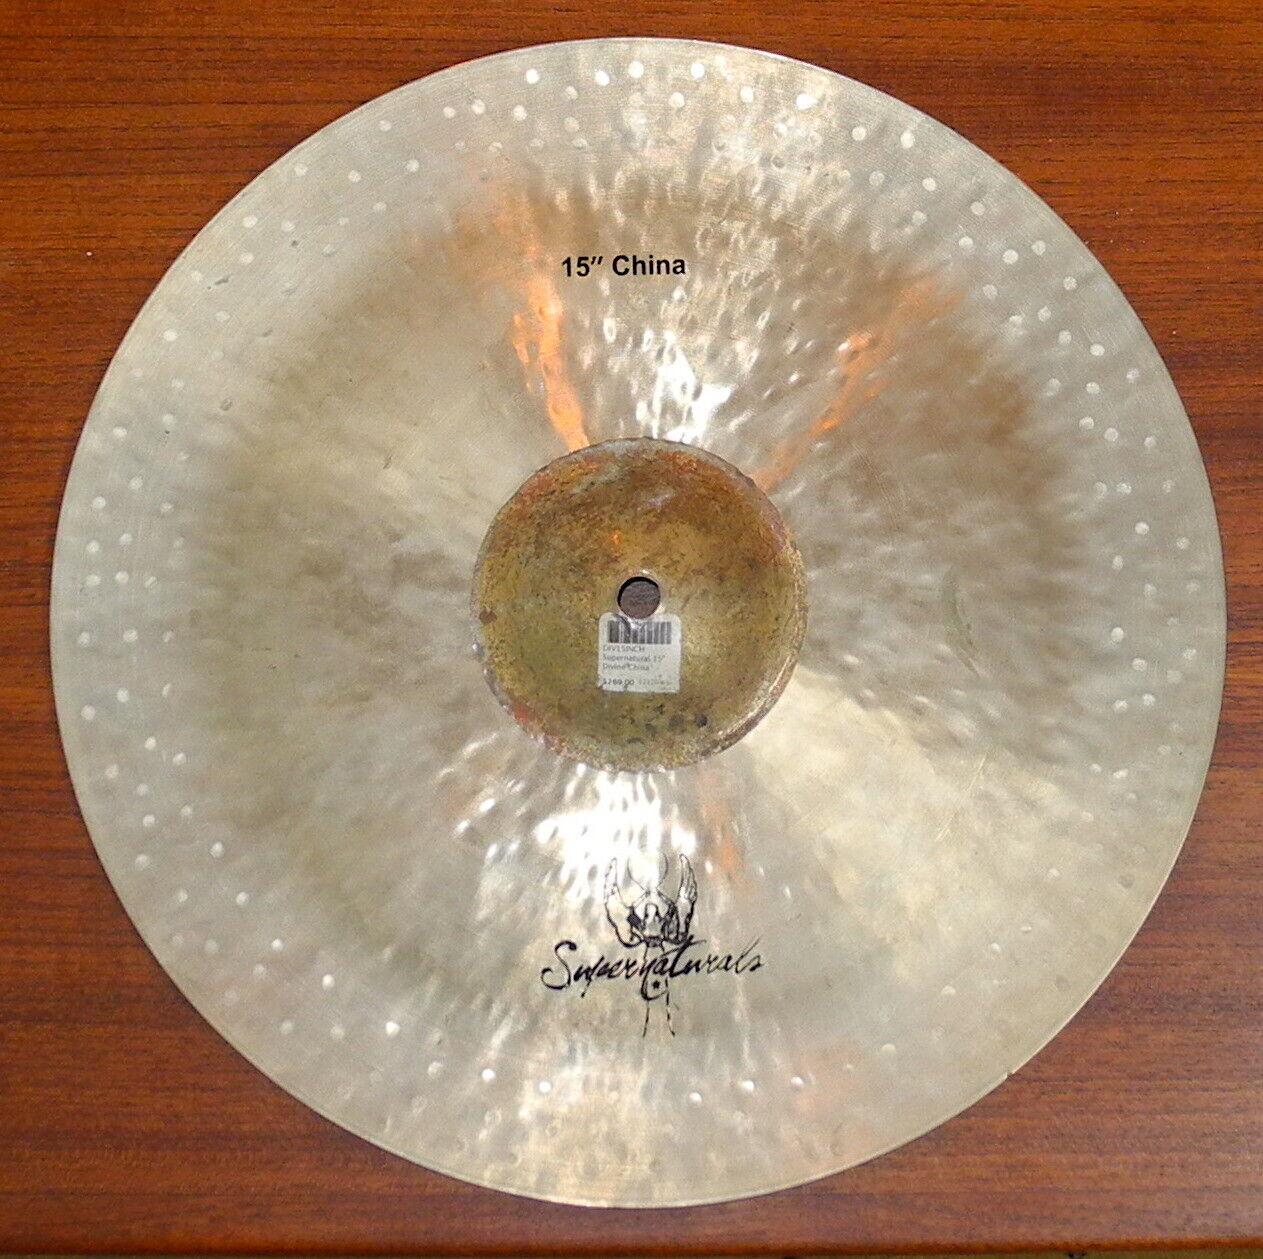 Supernaturals 15 Inch Divine China Drum Cymbal - $79.99